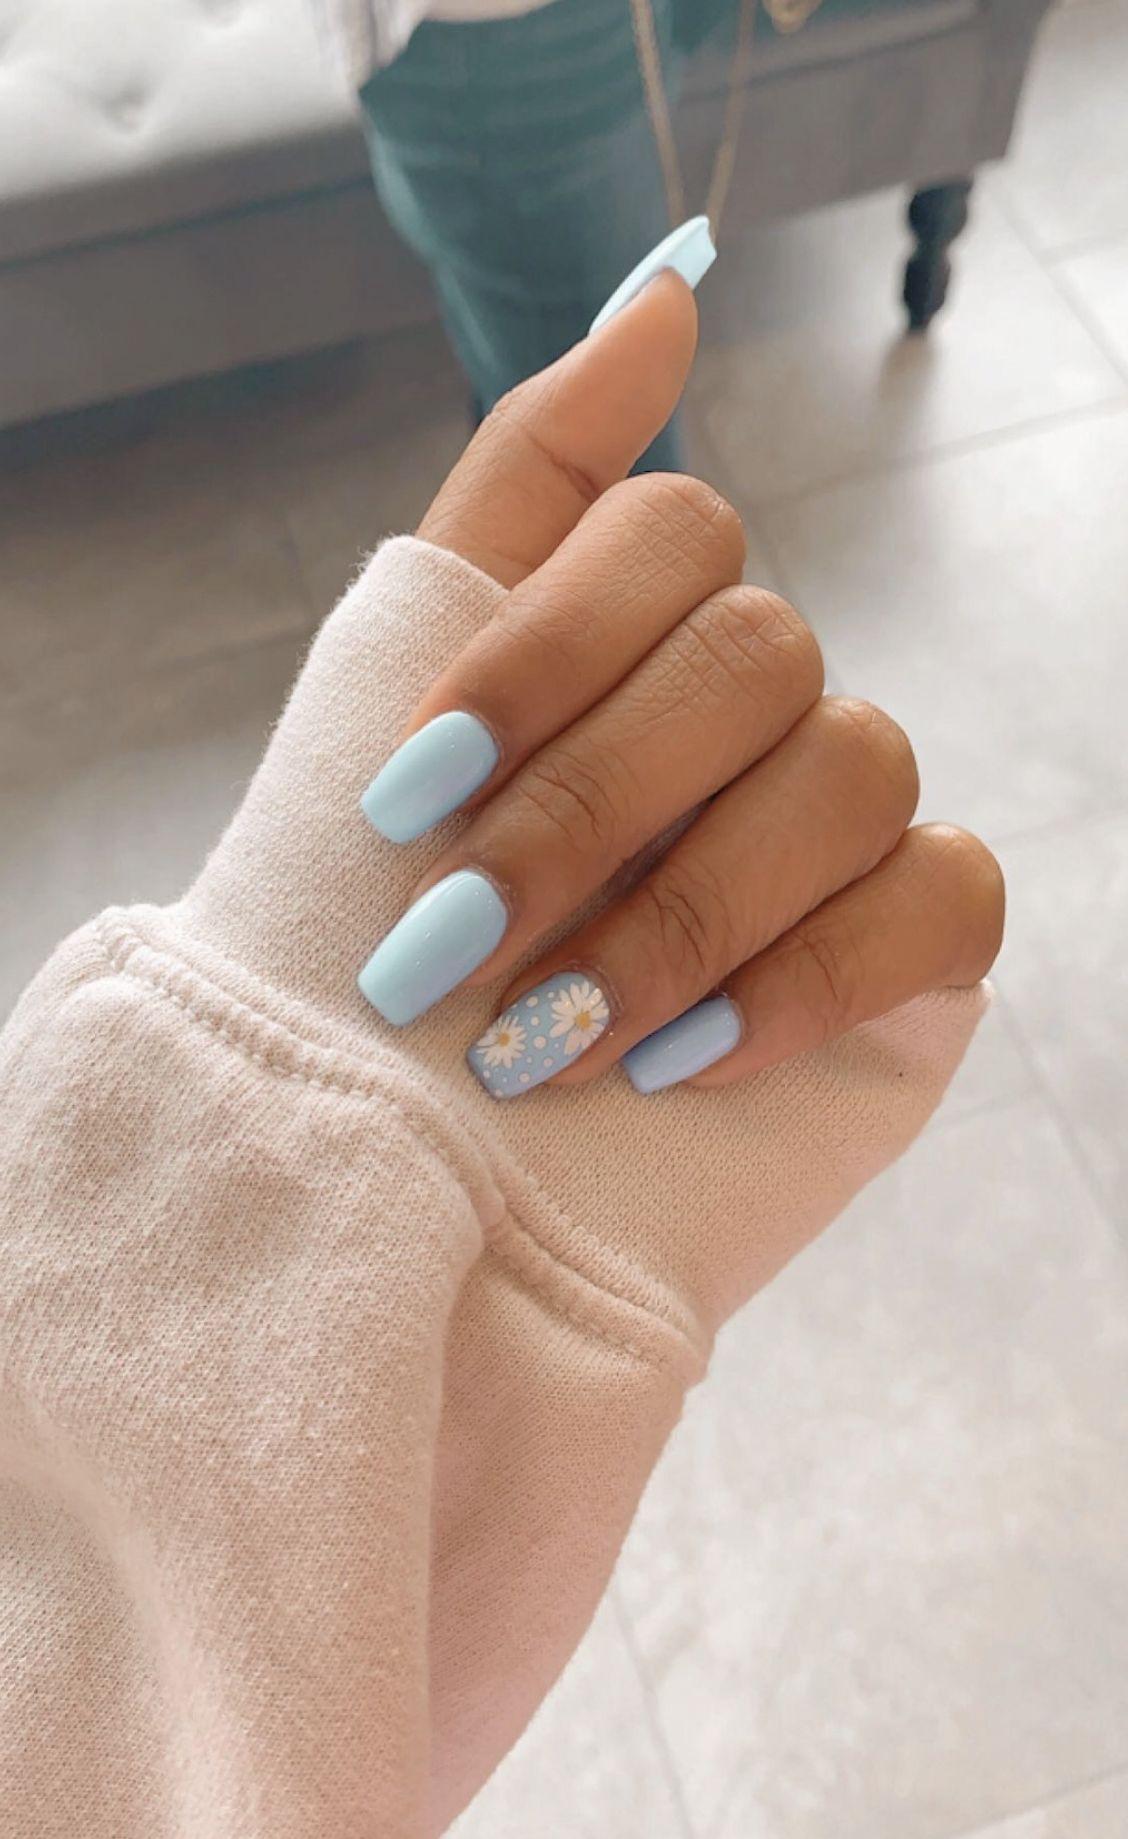 Vsco Chynamcghee Short Acrylic Nails Designs Blue Acrylic Nails Simple Acrylic Nails